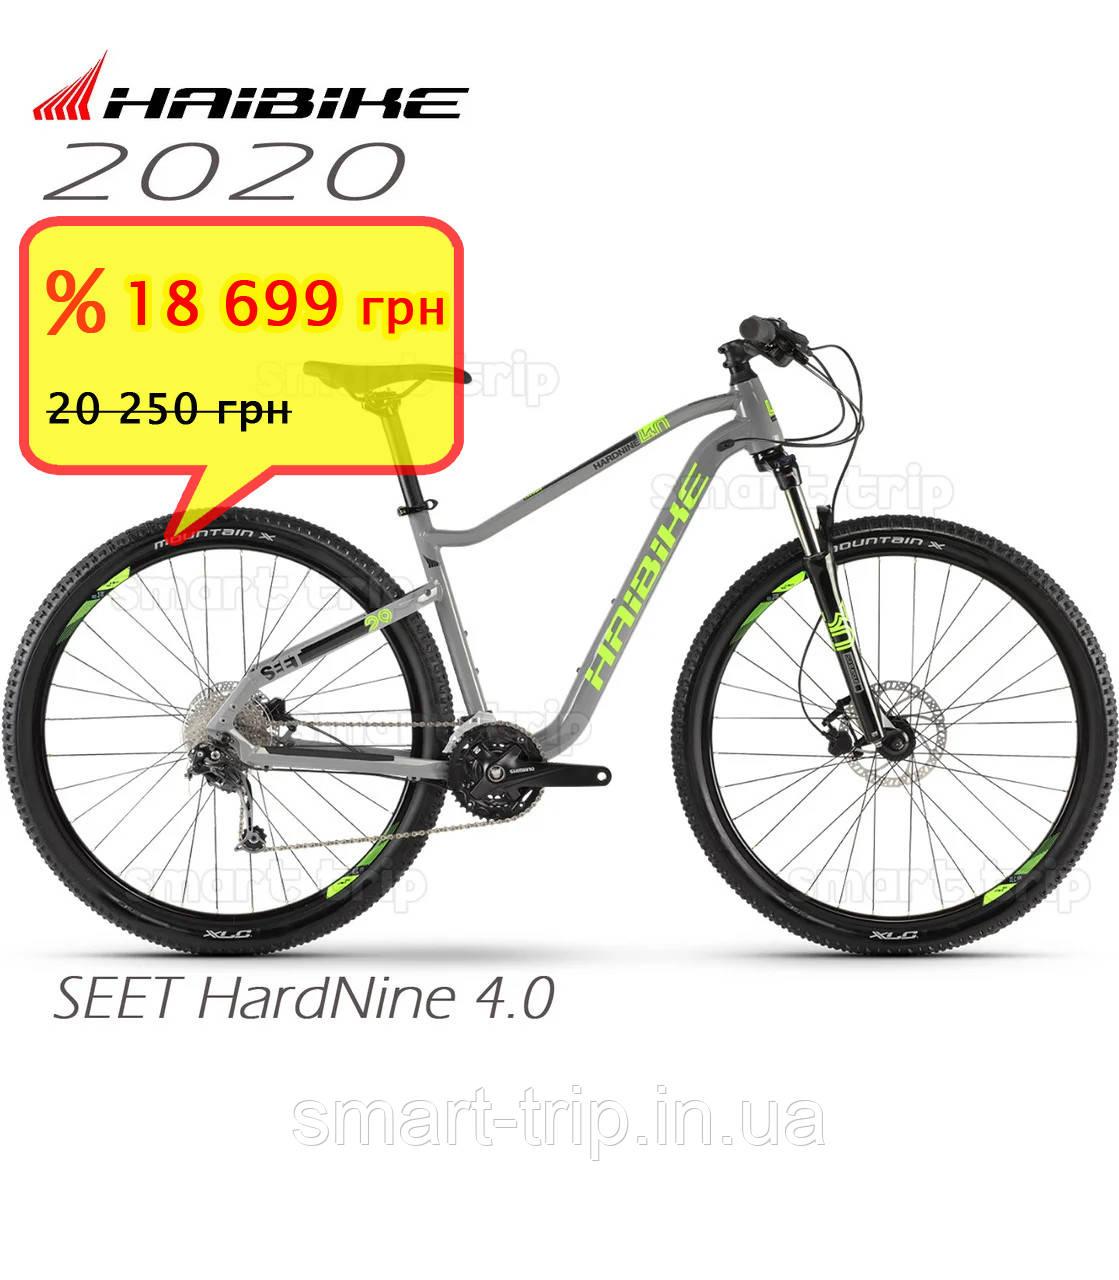 Велосипед 29 HAIBIKE SEET HardNine 4.0 рама L серый 2020 SALE s-4100138950